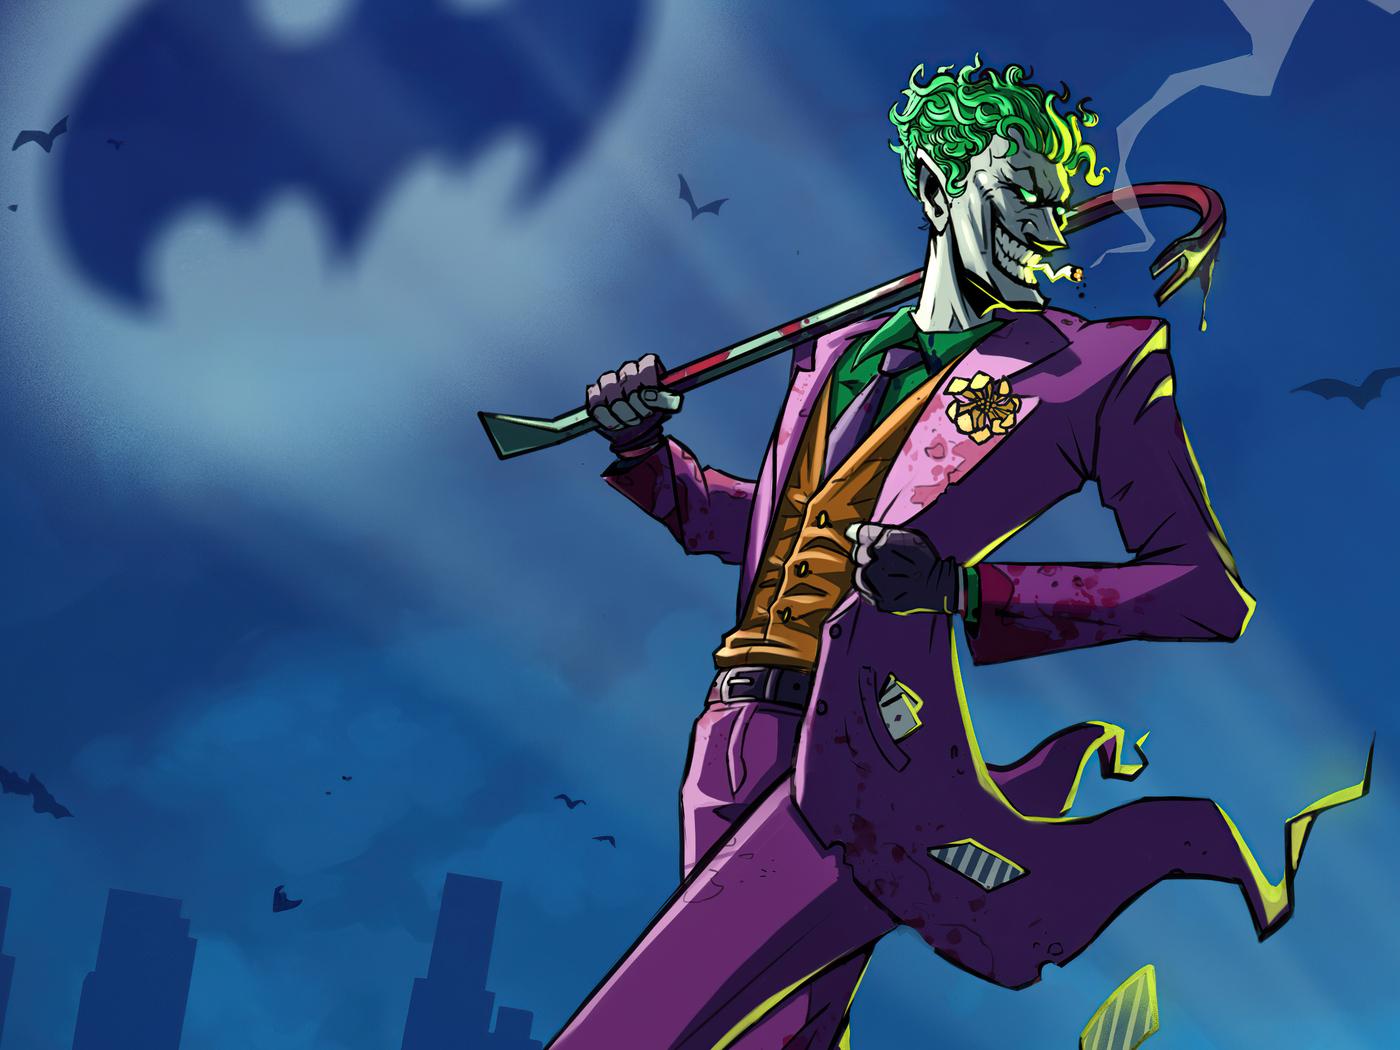 1400x1050 Joker Take Over Gotham City 1400x1050 Resolution ...